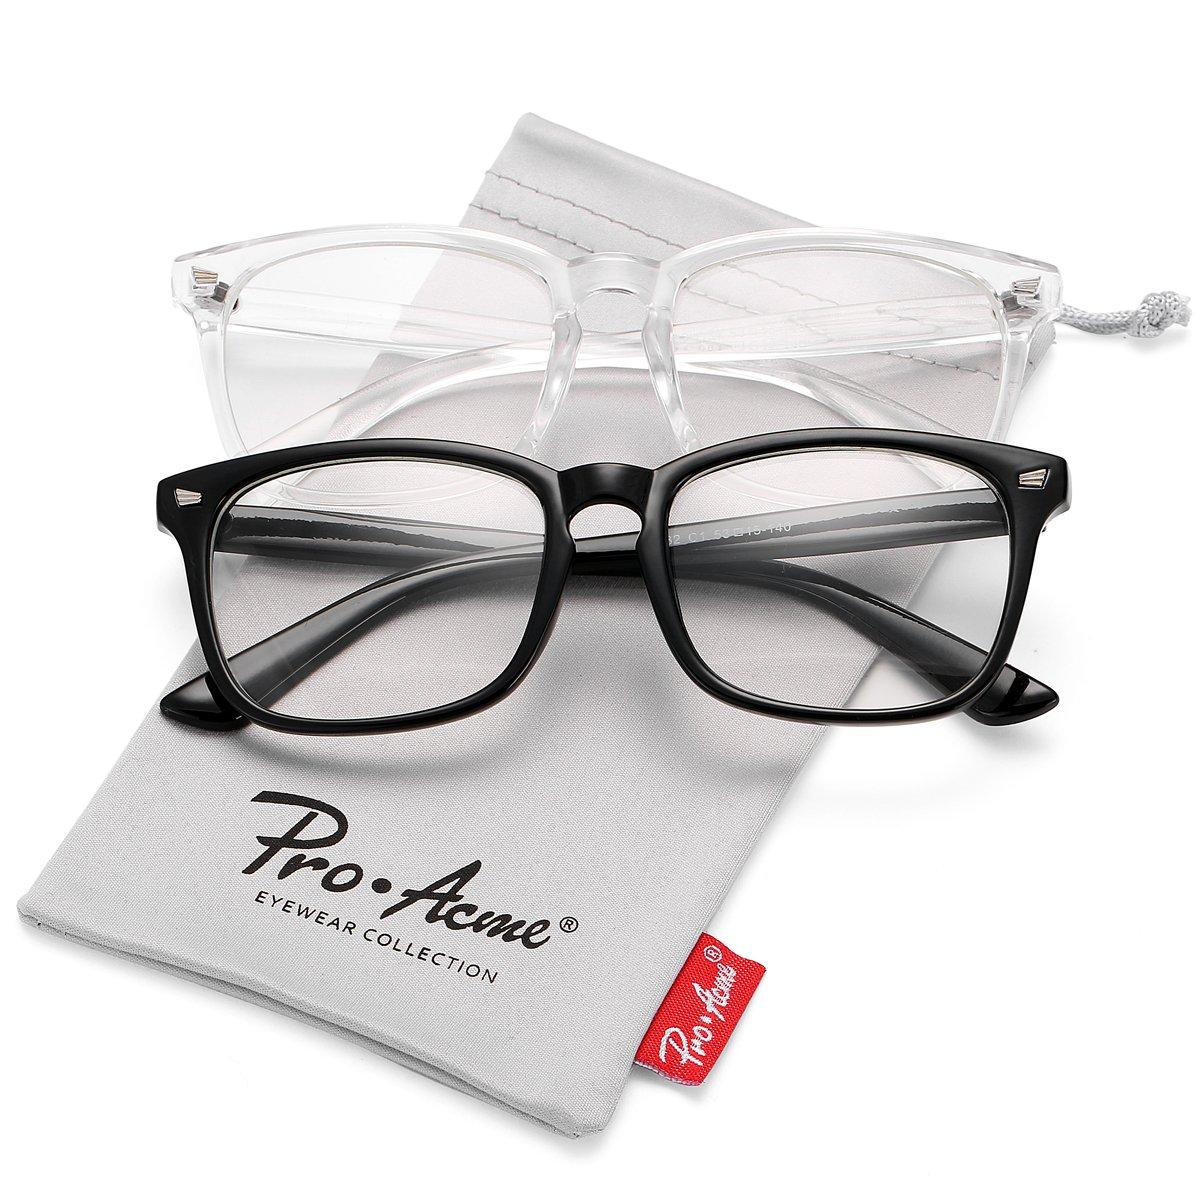 e15326d1b66e5 Pro Acme New Wayfarer Non-prescription Glasses Frame Clear Lens Eyeglasses